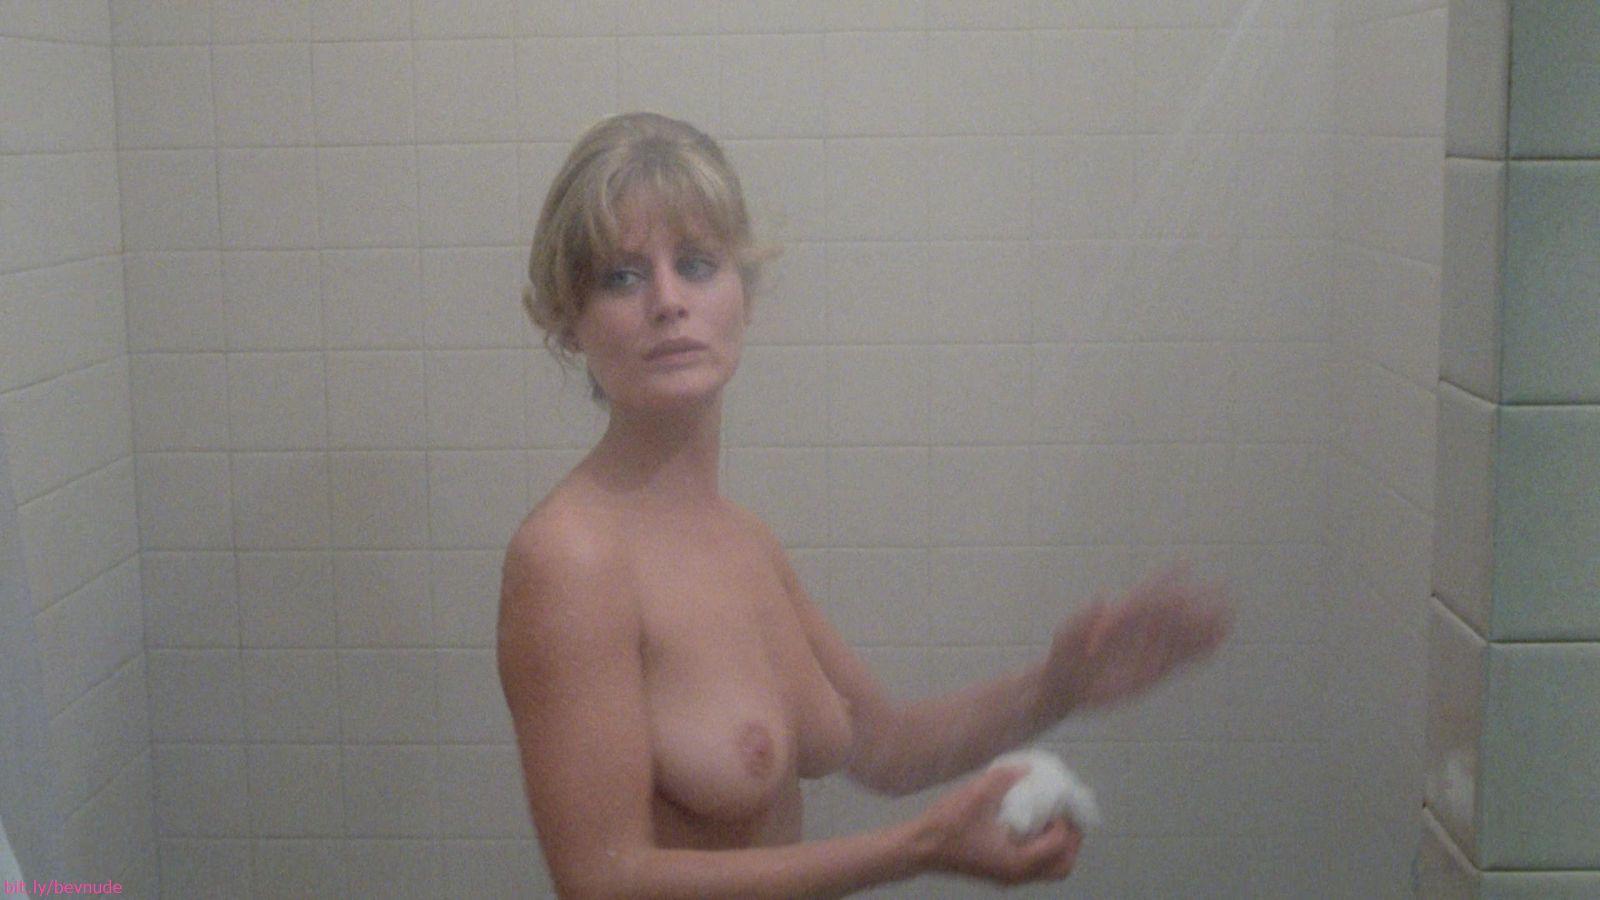 National lampoon big boob girl